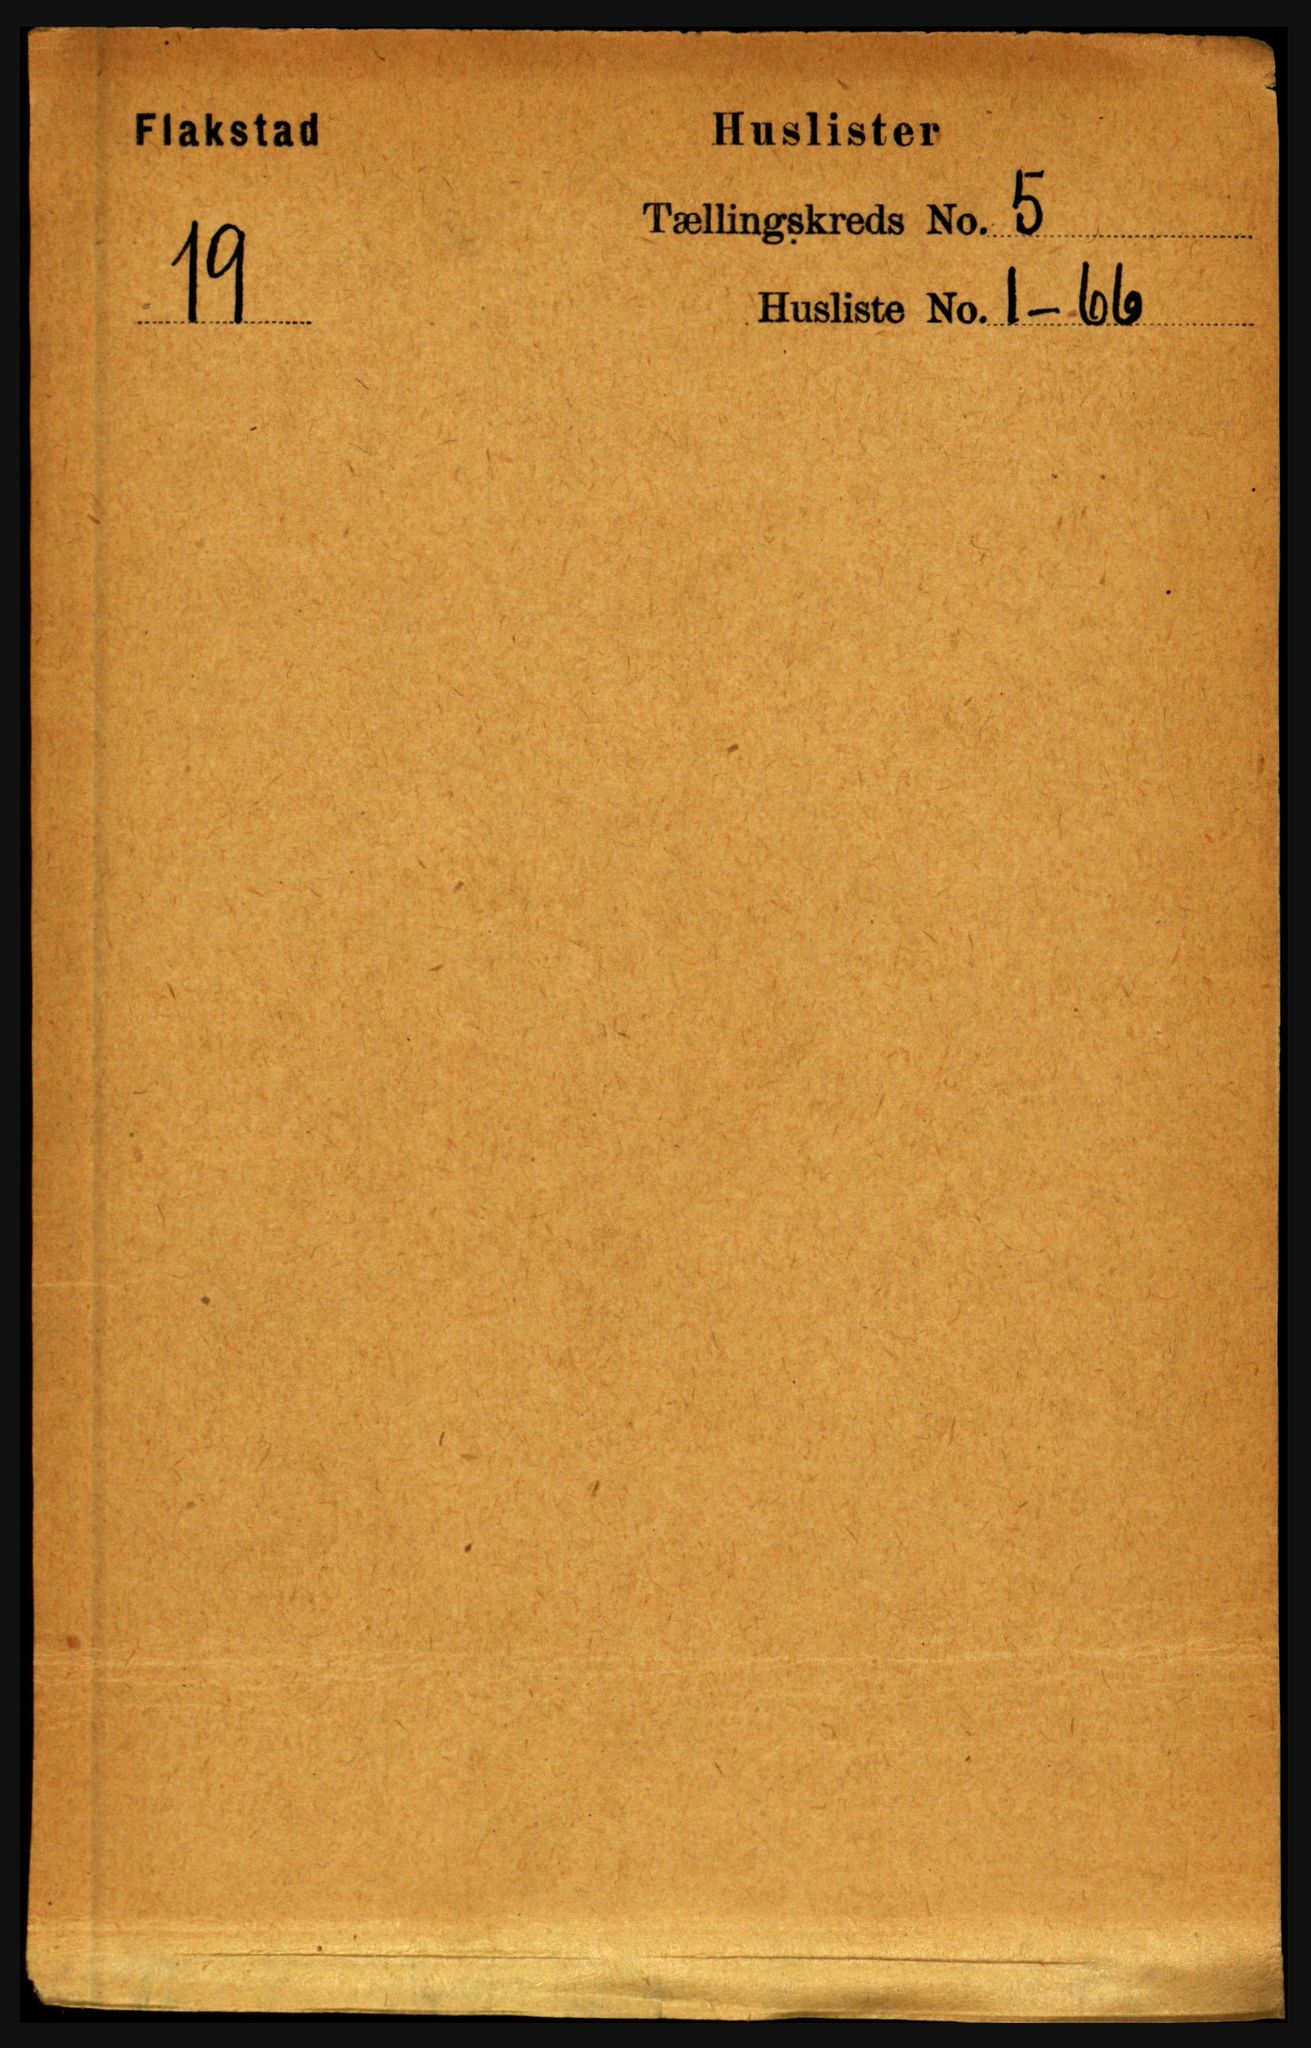 RA, Folketelling 1891 for 1859 Flakstad herred, 1891, s. 2403